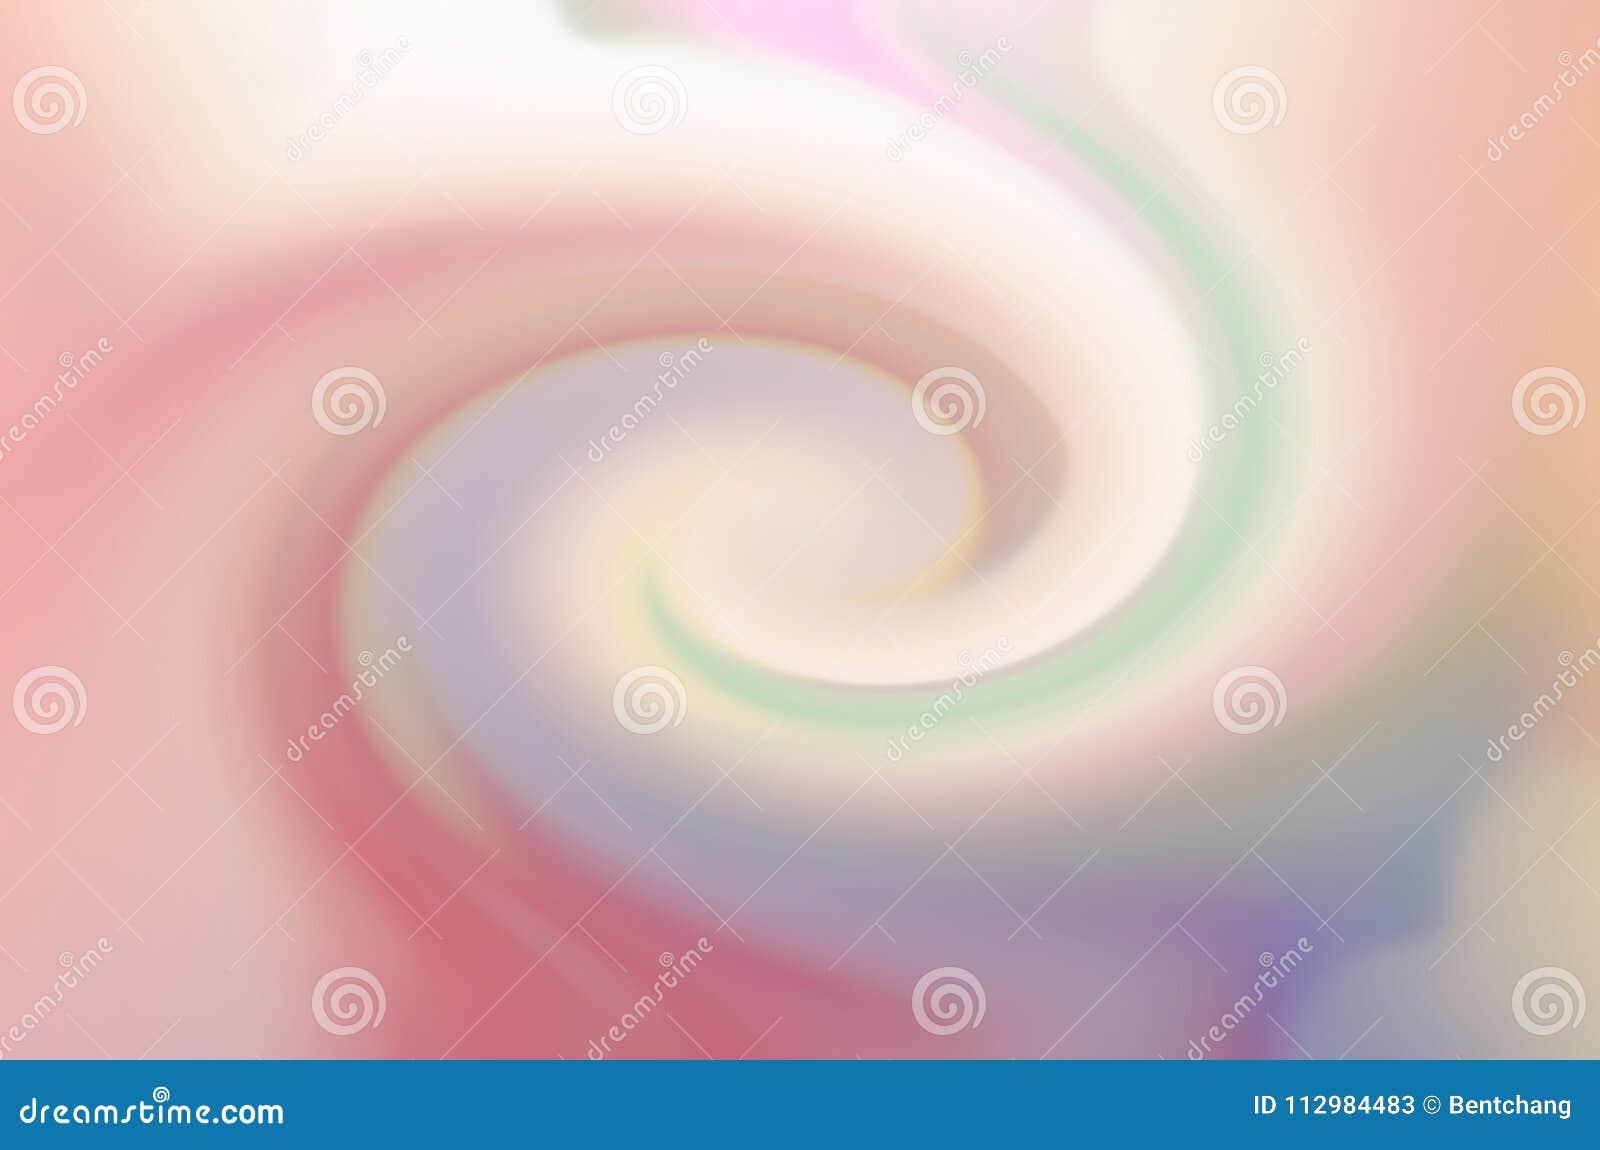 Illustrations of motion. For wallpaper or graphic design. Blur, backdrop, imagination, ripple & nature.